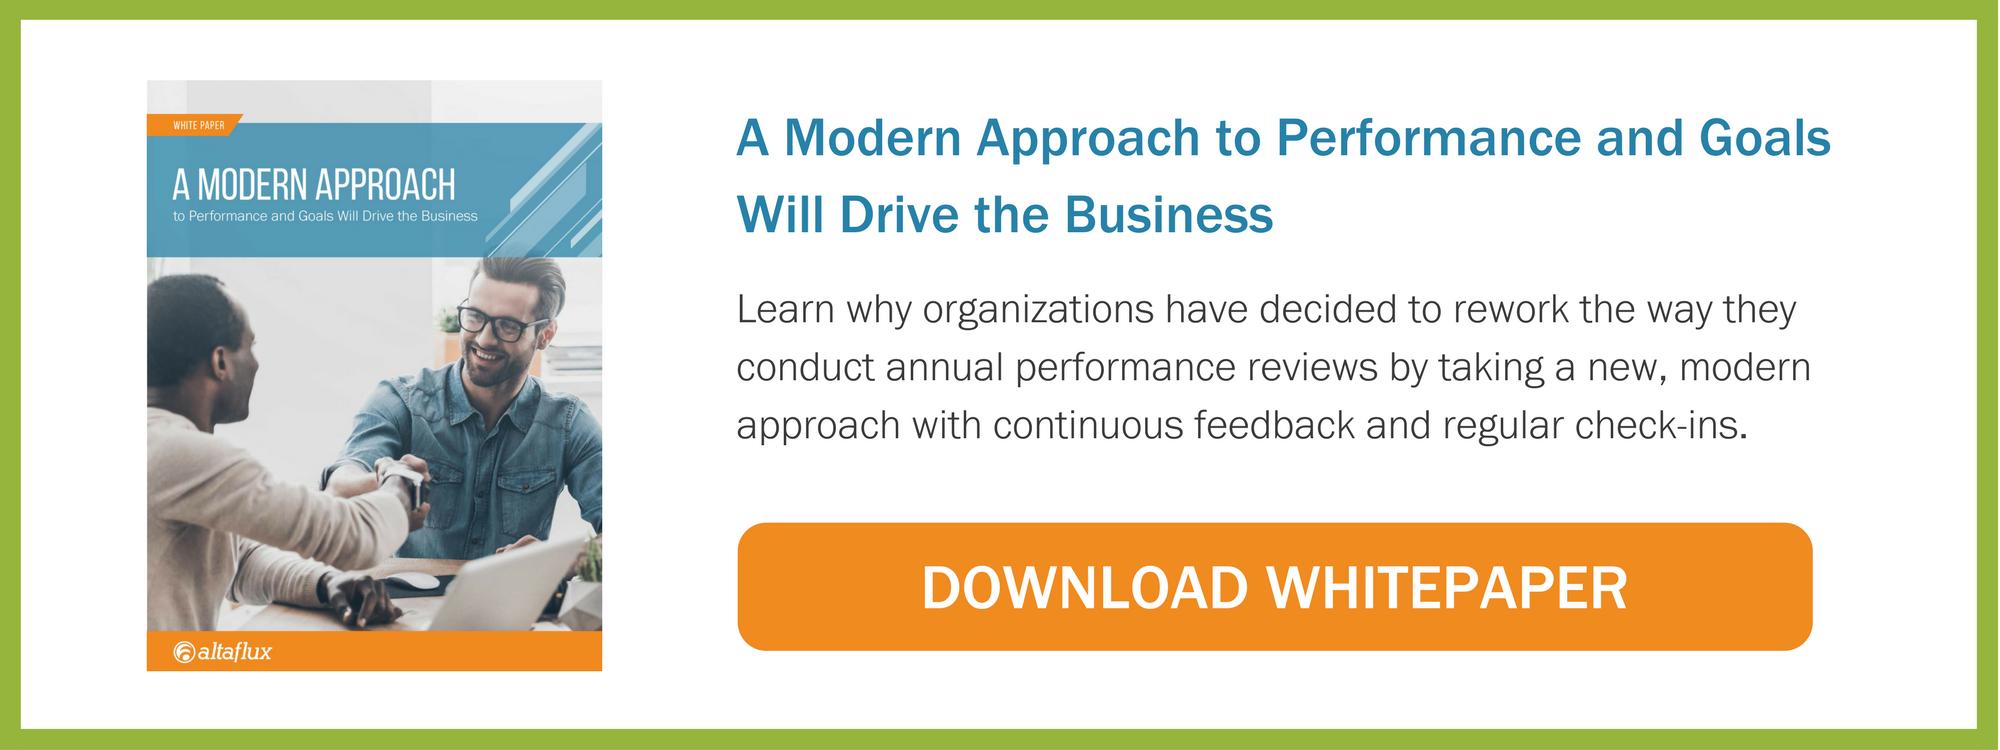 A Modern Approach to Performance Management